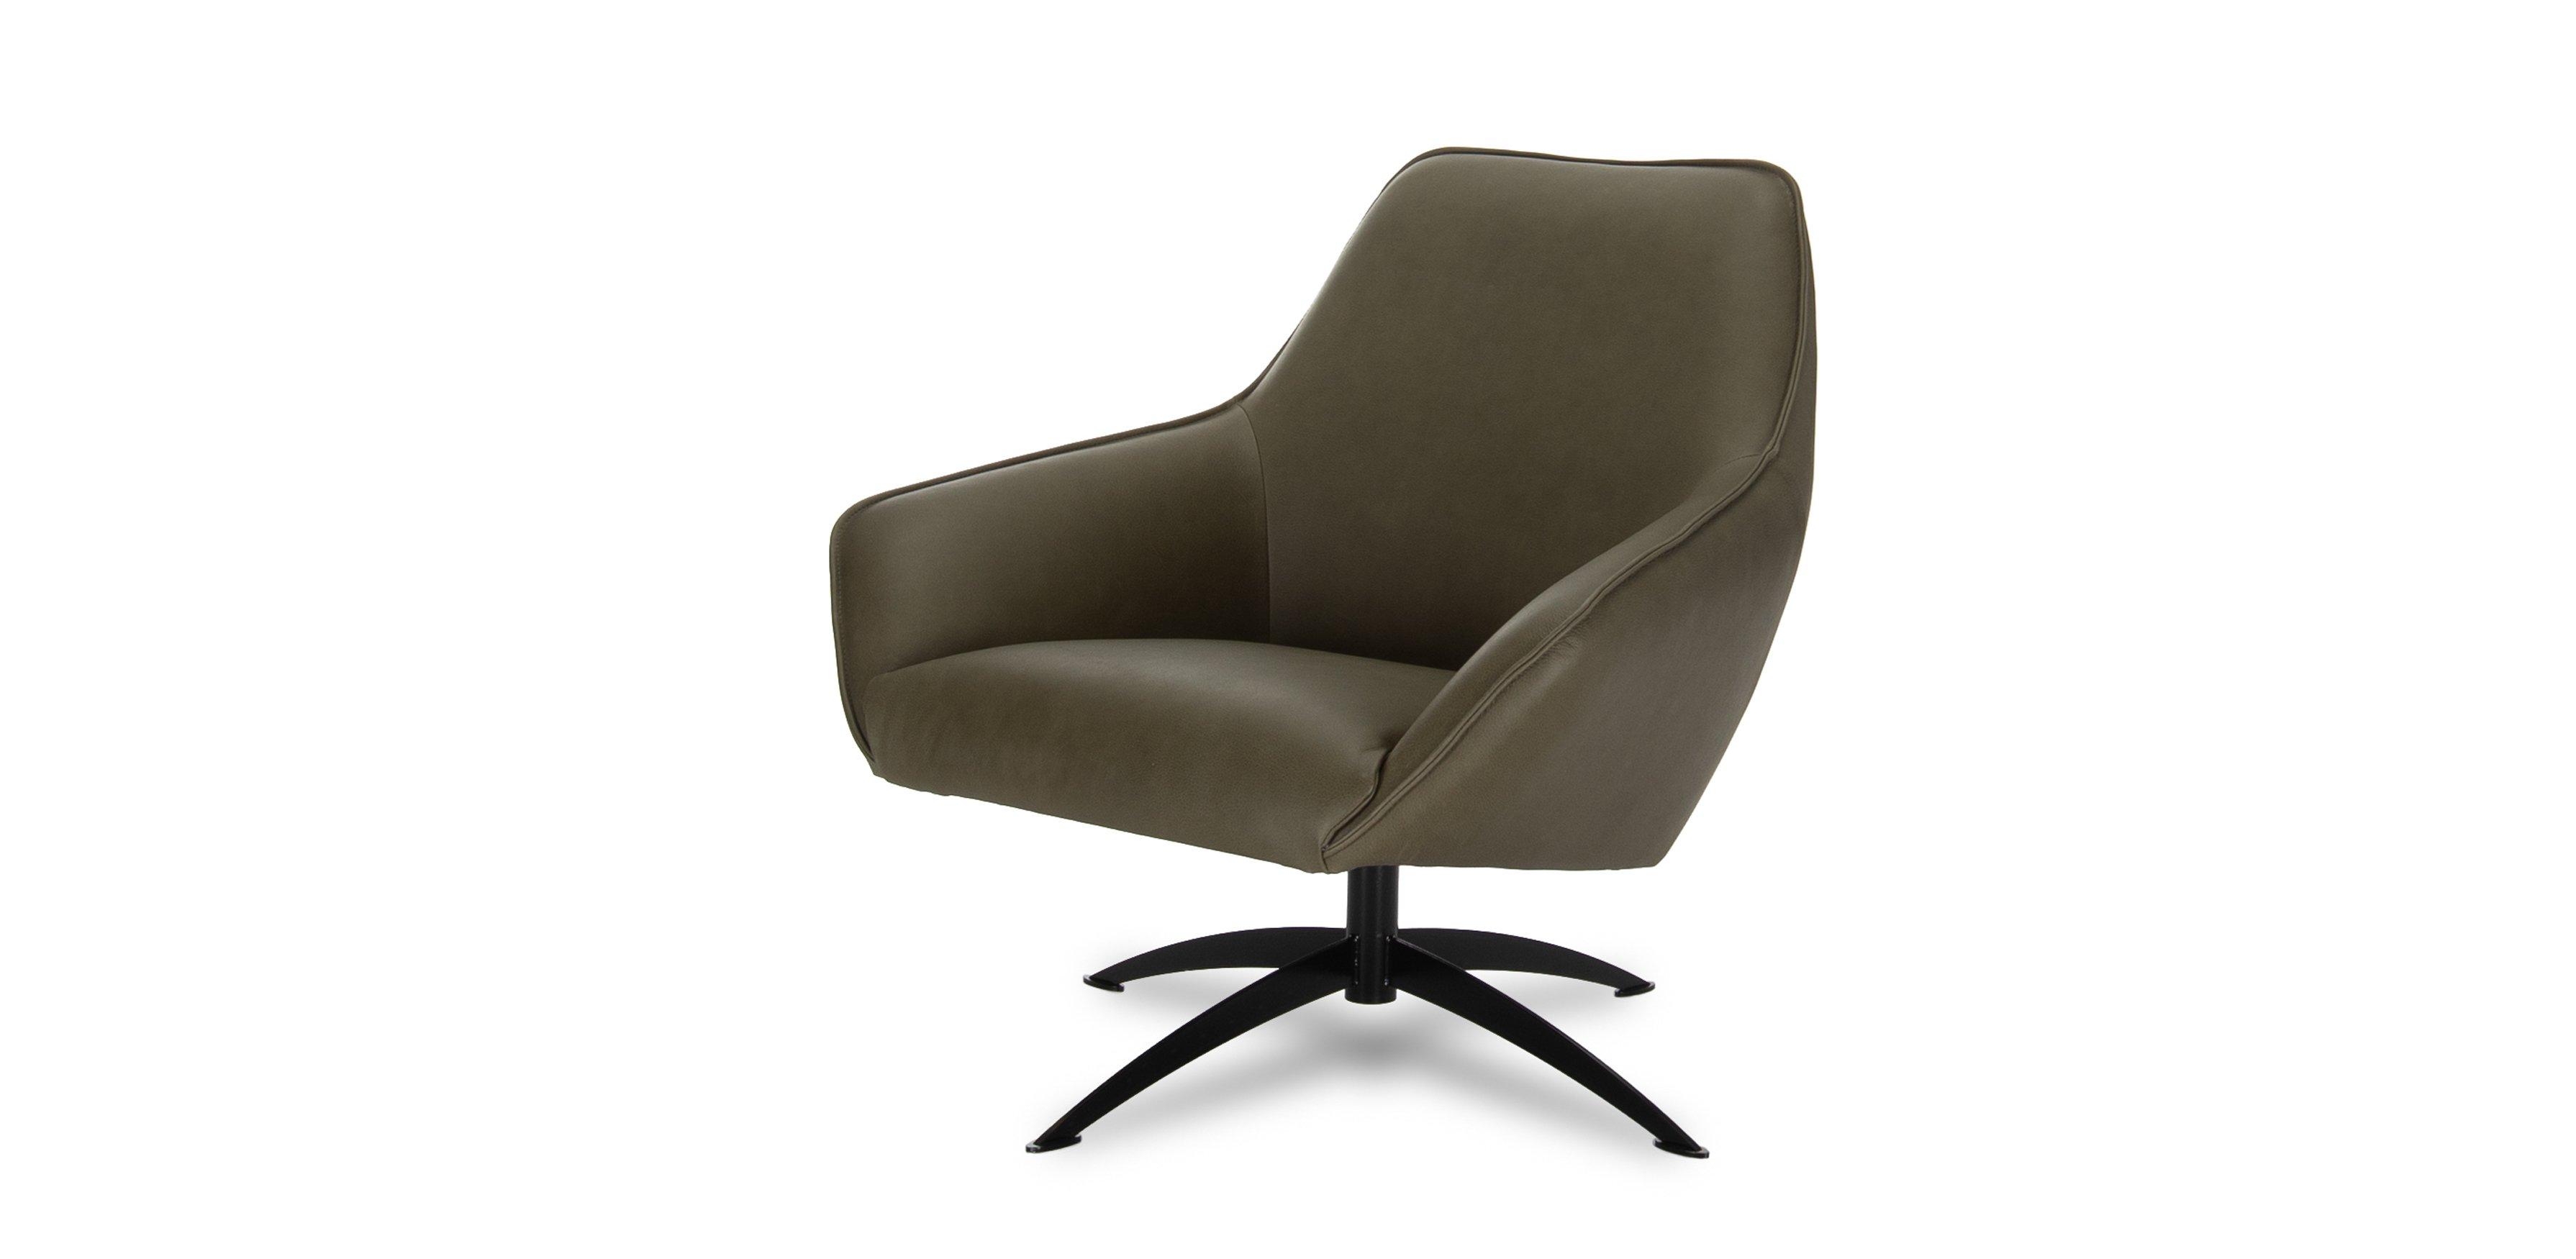 Faas fauteuil DYYK 3580x1750 leer 2